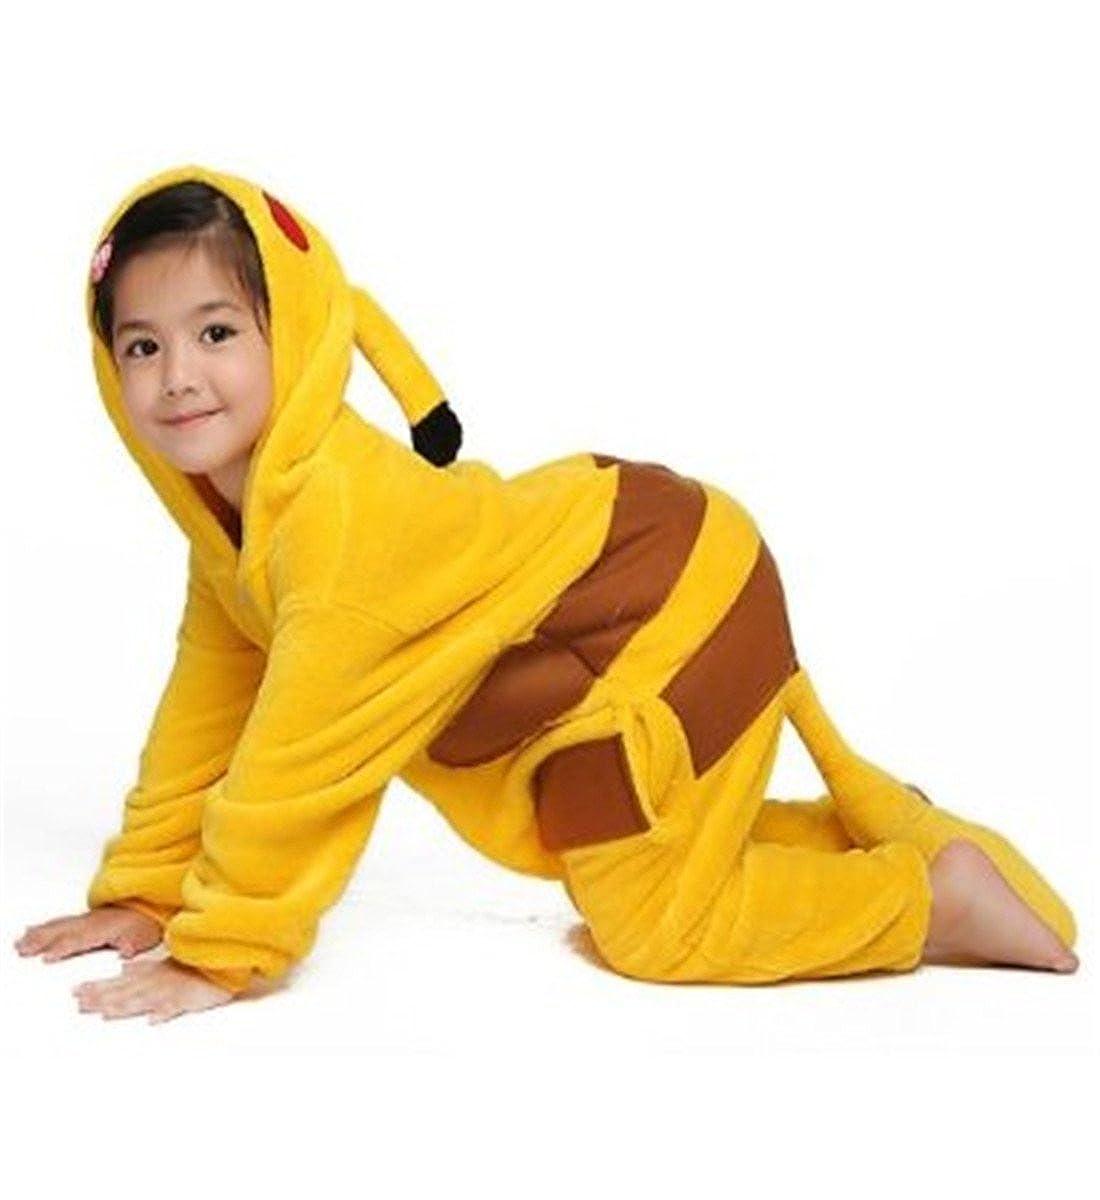 WOWcosplay Pokemon Pikachu Kigurumi Pijama Animal Cosplay Disfraz de Halloween